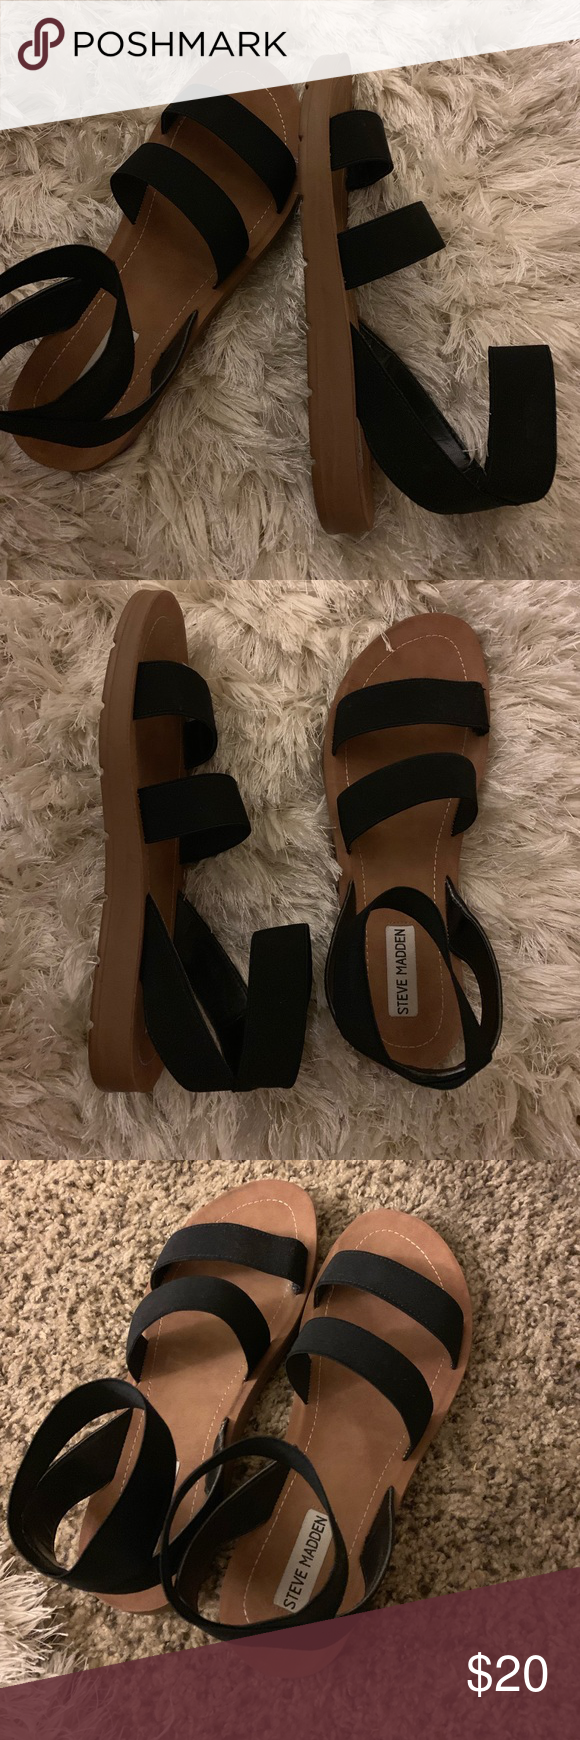 Steve Madden Raffy Sandals, BARELY WORN